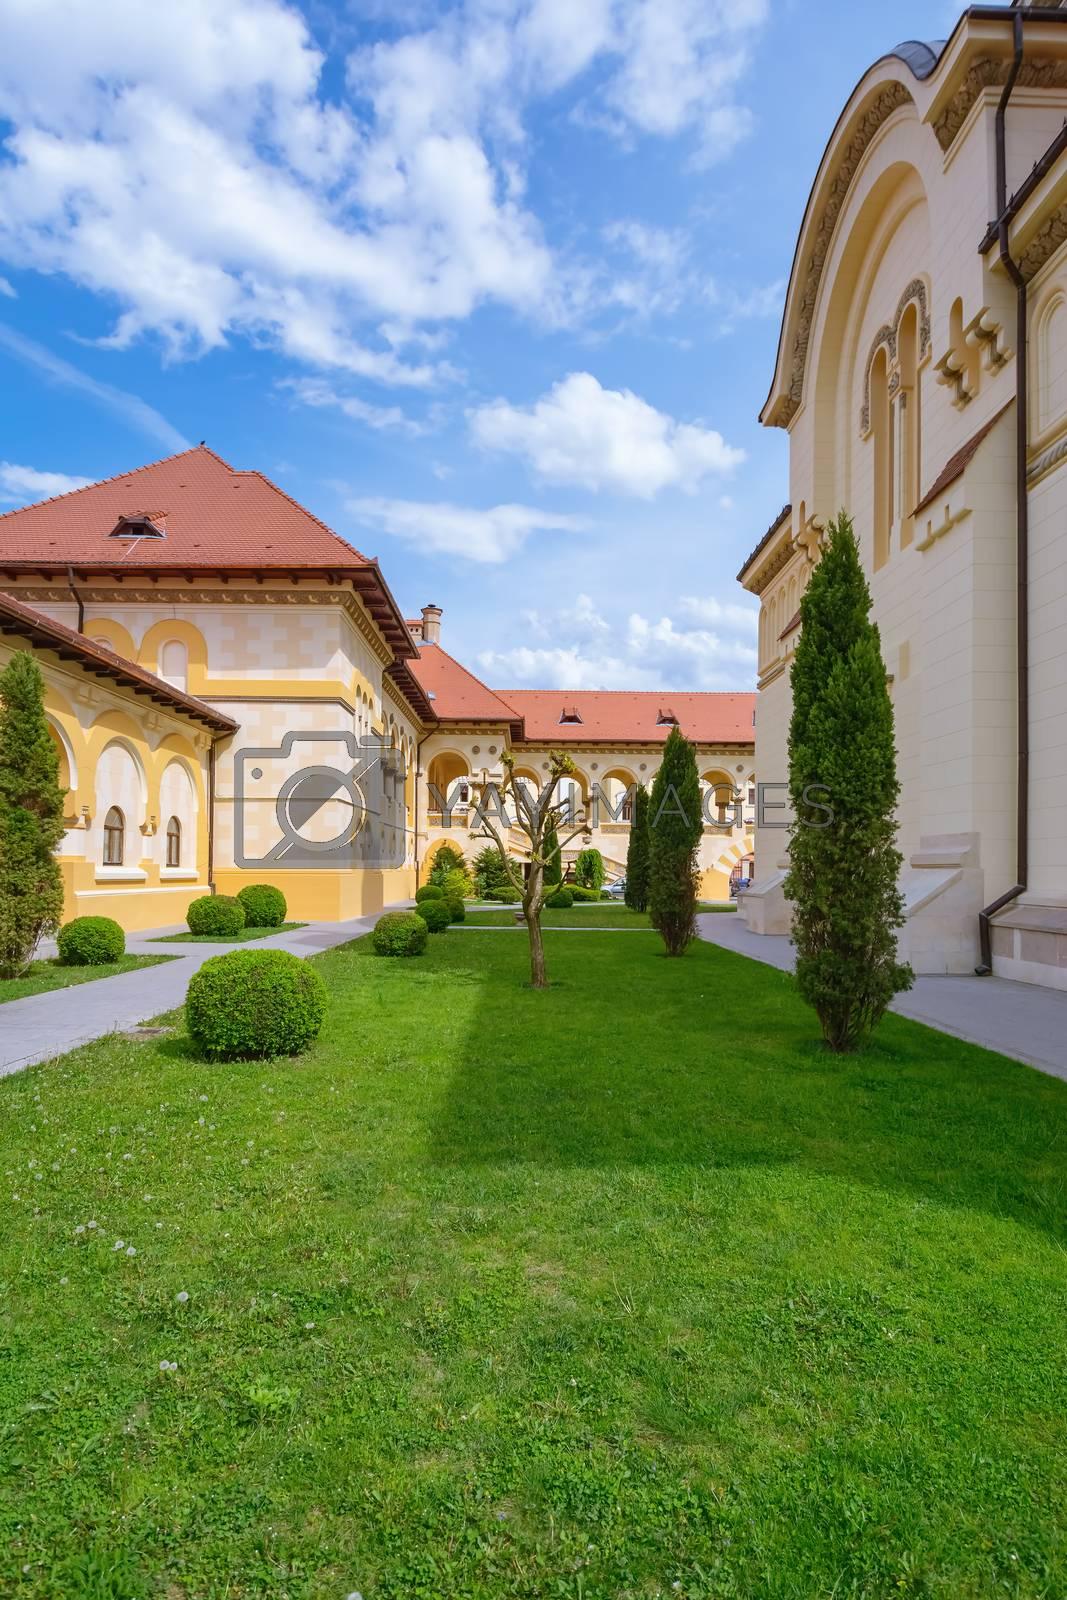 Inner Courtyard of Coronation Cathedral in Alba Carolina Citadel. Alba Iulia, Romania